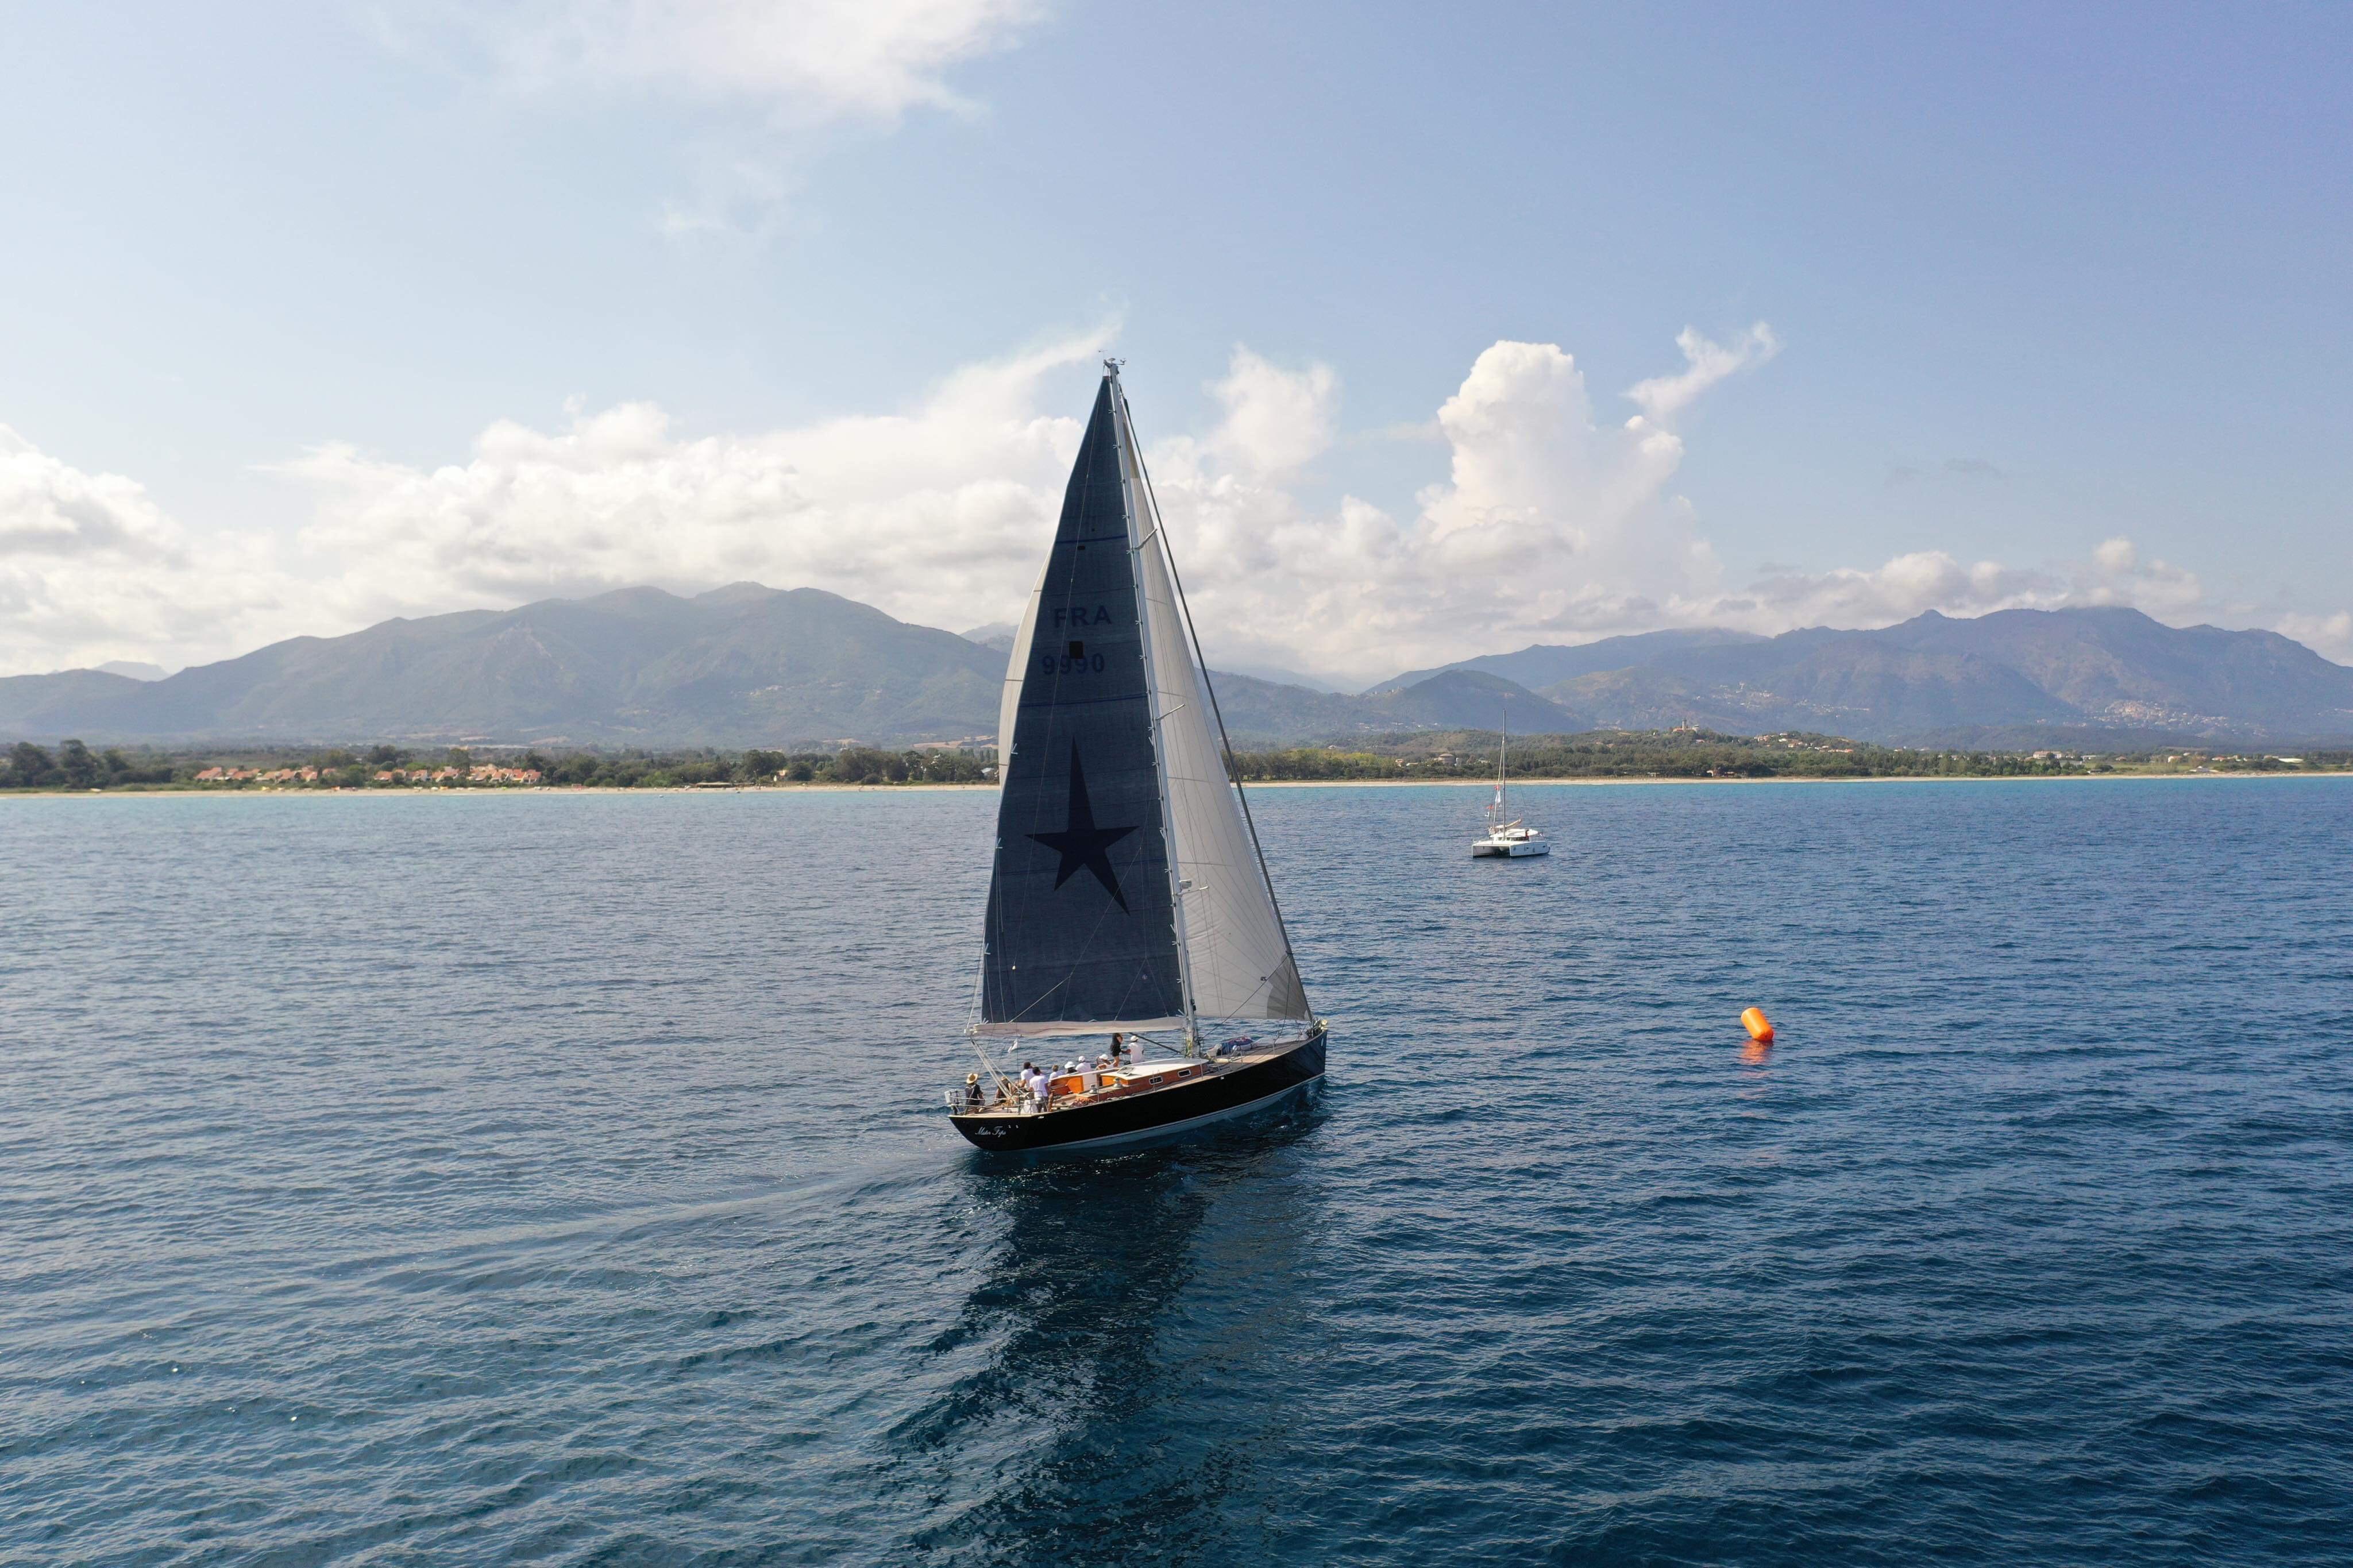 CC 2019 SY Mister Fips ligne d'arrivé Sari-Solenzara - Bastia photo JP Pyrée DR